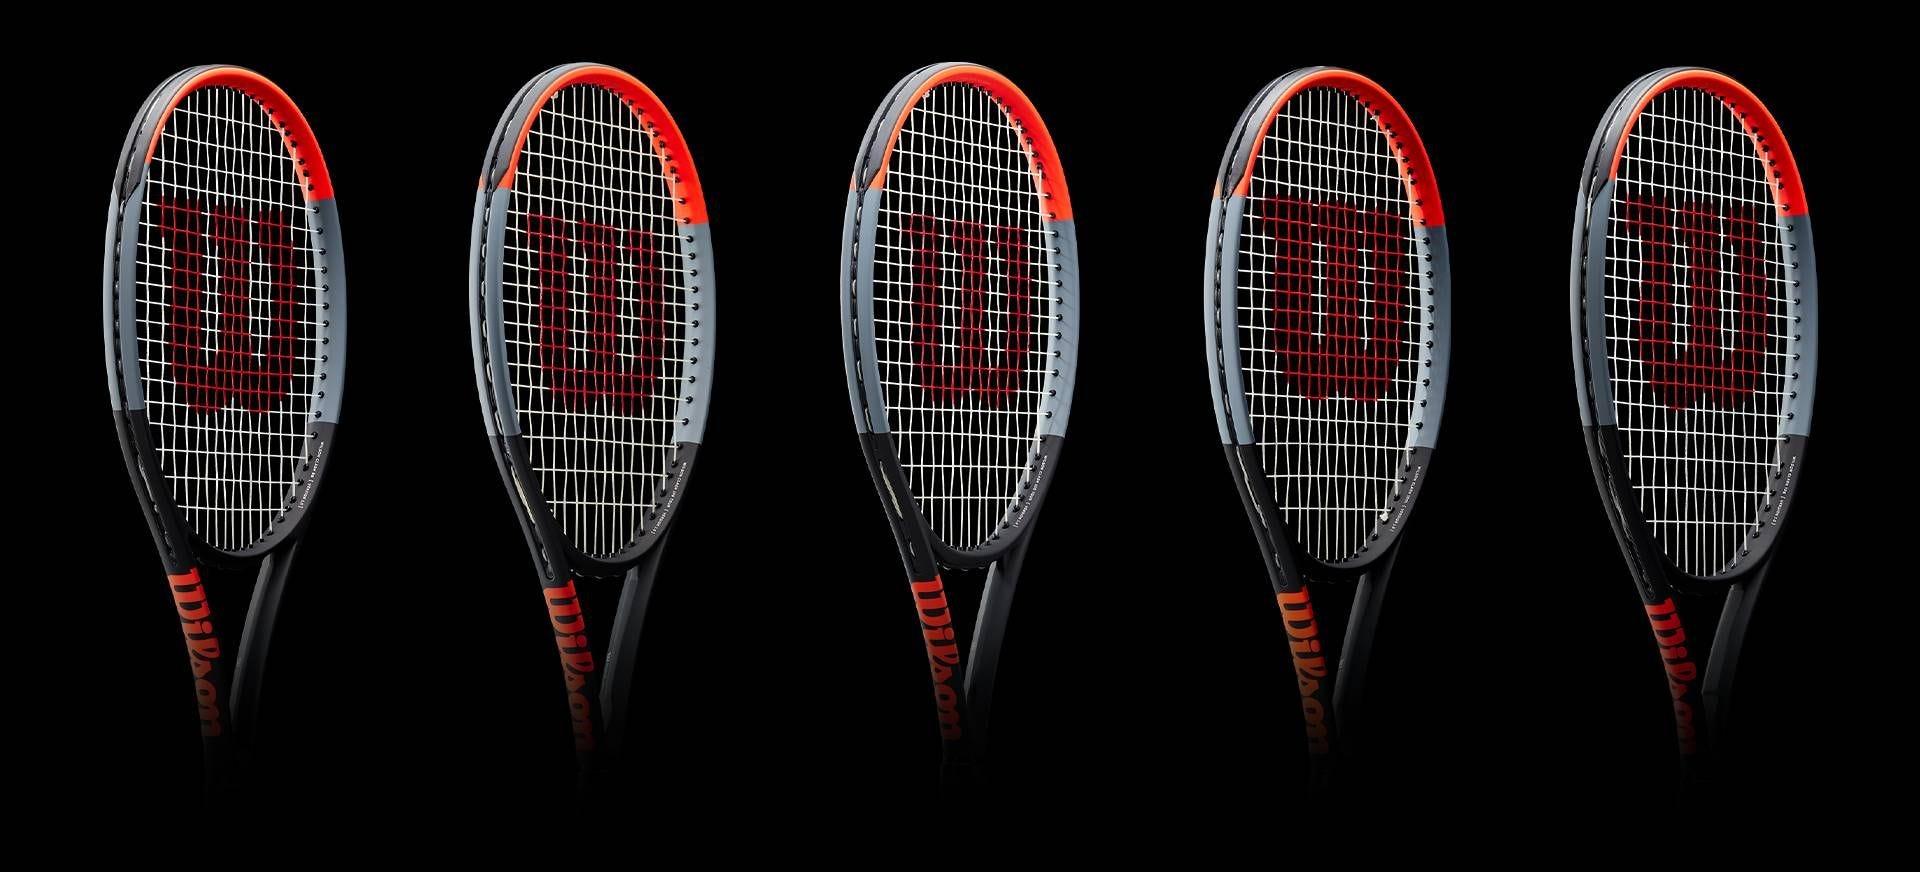 Lineup of Clash Tennis Rackets